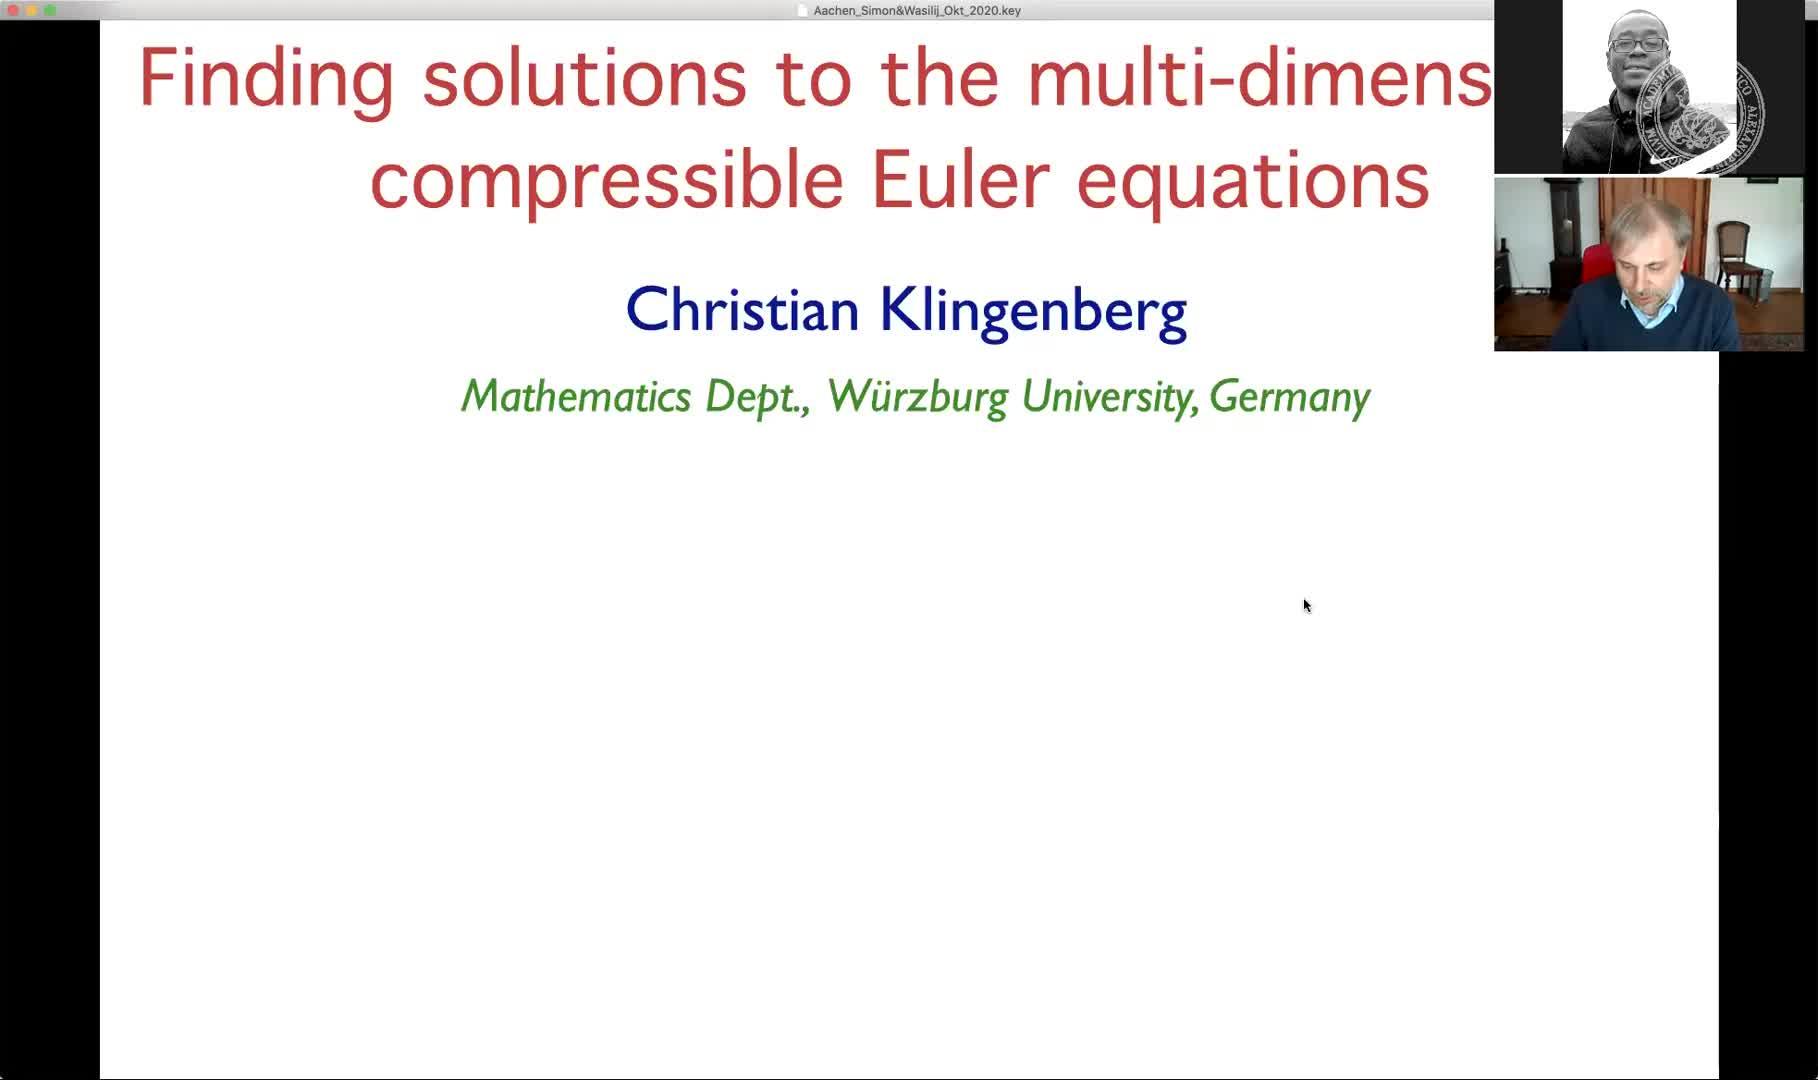 Finding solutions of the multi-dimensional compressible Euler equations (Christian Klingenberg, Universität Würzburg) preview image